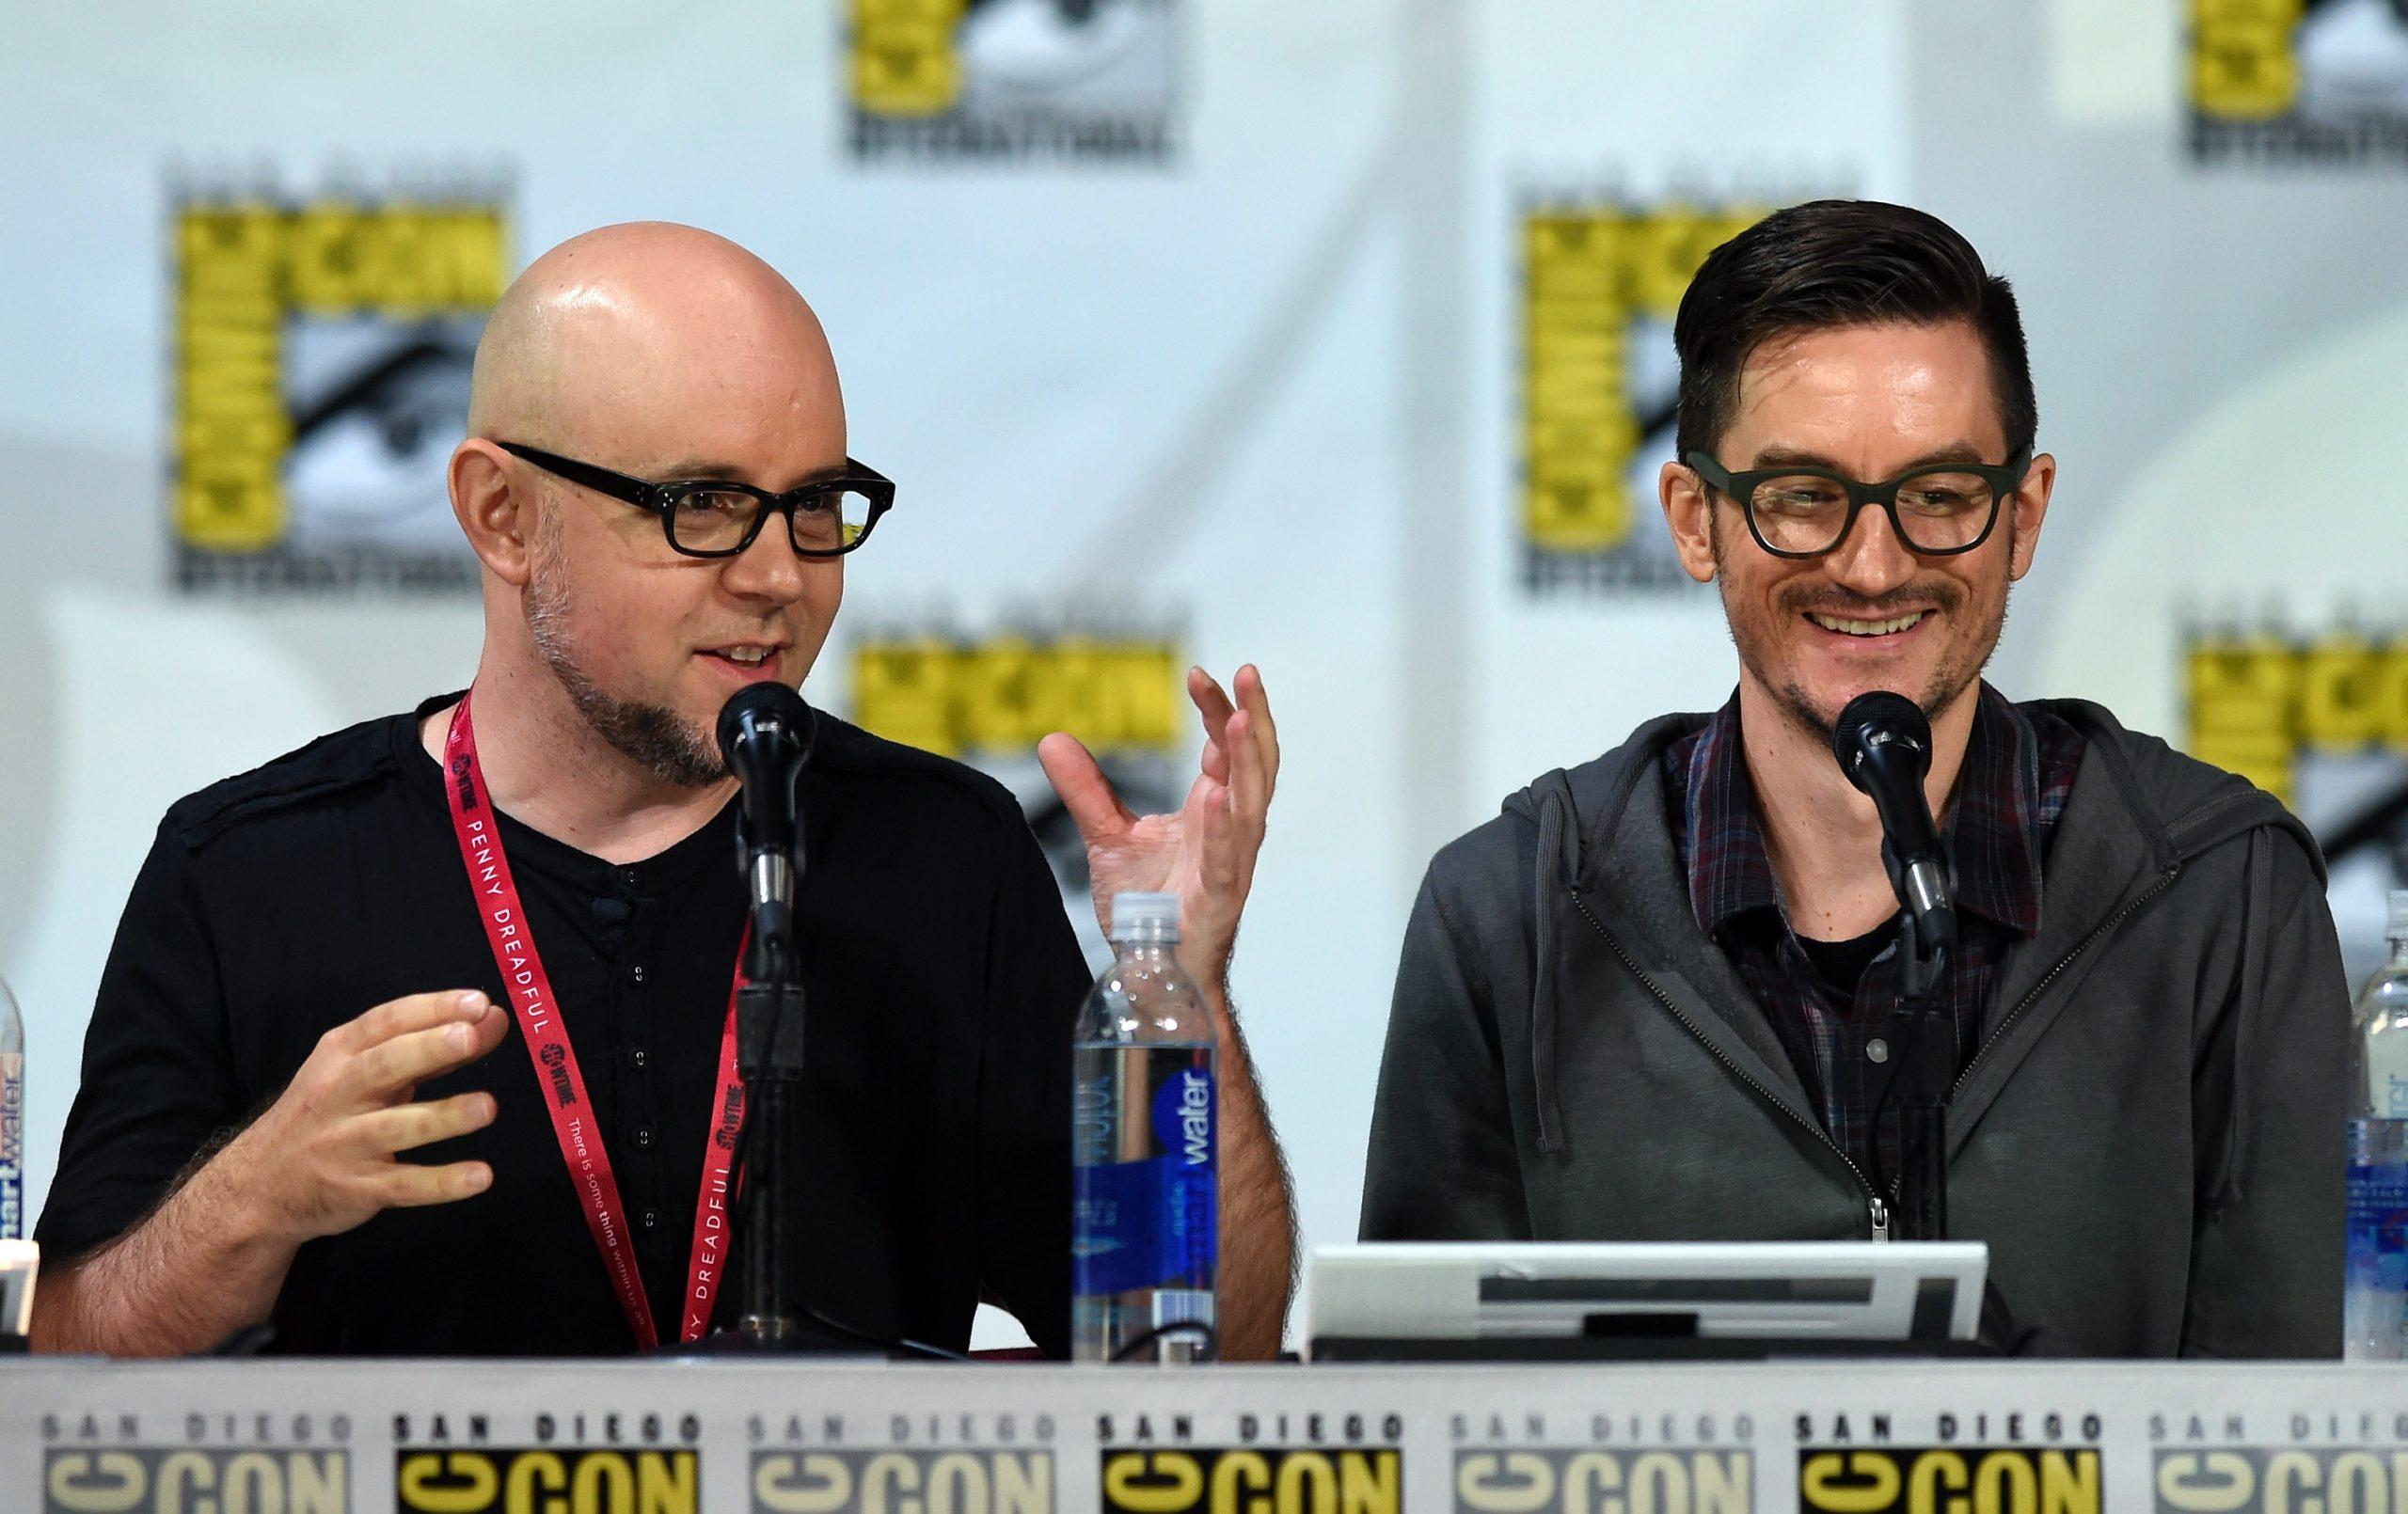 Writer/director Michael Dante DiMartino (L) and writer/producer Bryan Konietzko, creators of Avatar: The Last Airbender